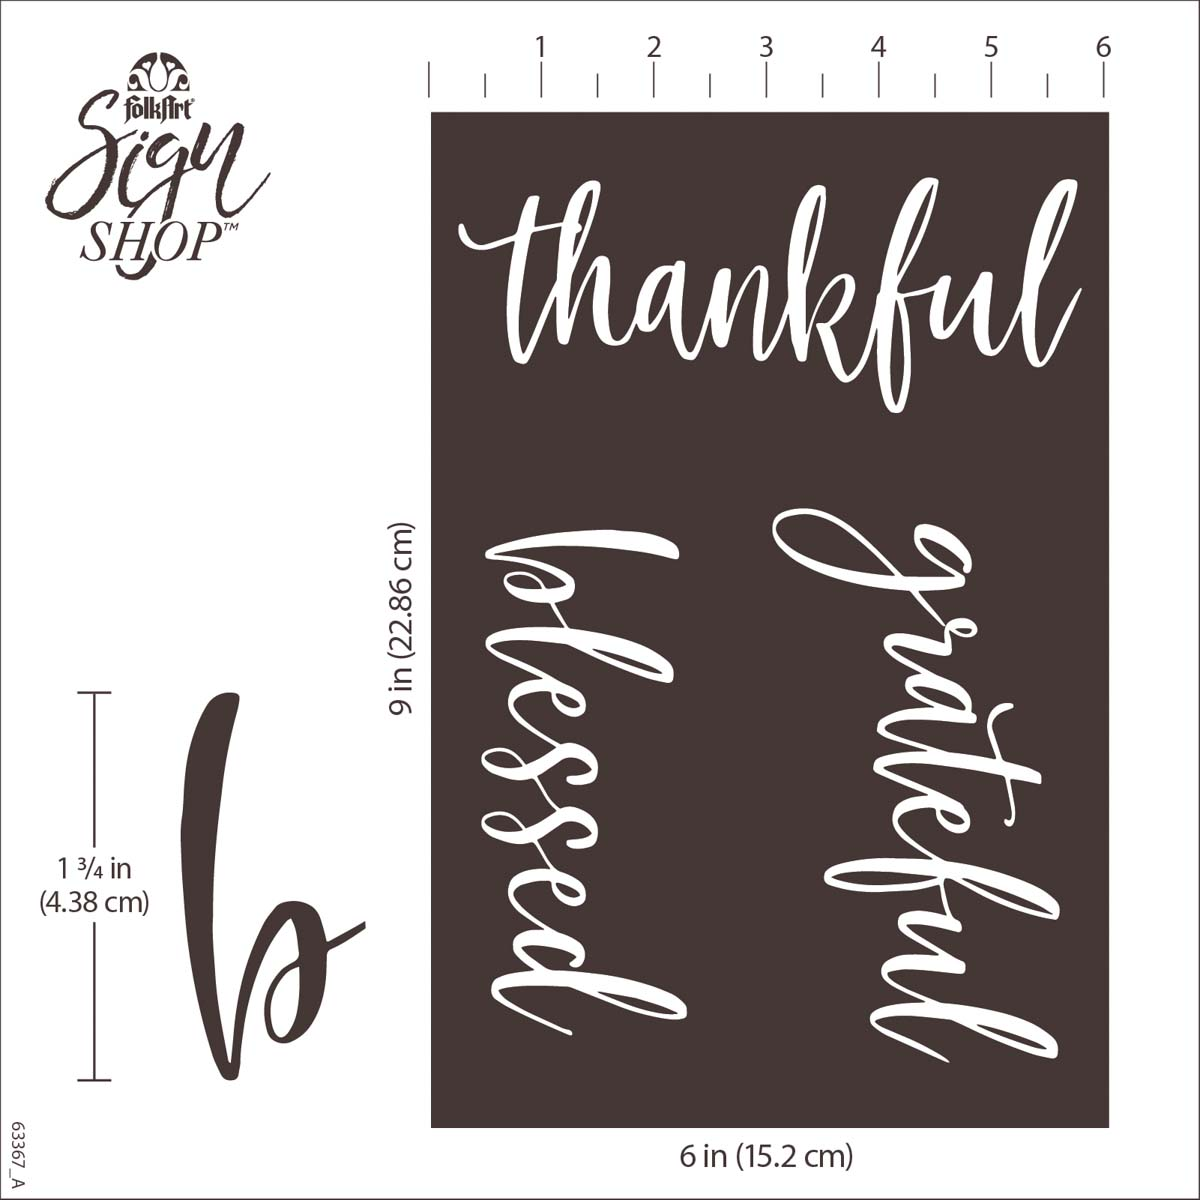 FolkArt ® Sign Shop™ Mesh Stencil - So Grateful, 2 pc. - 63367